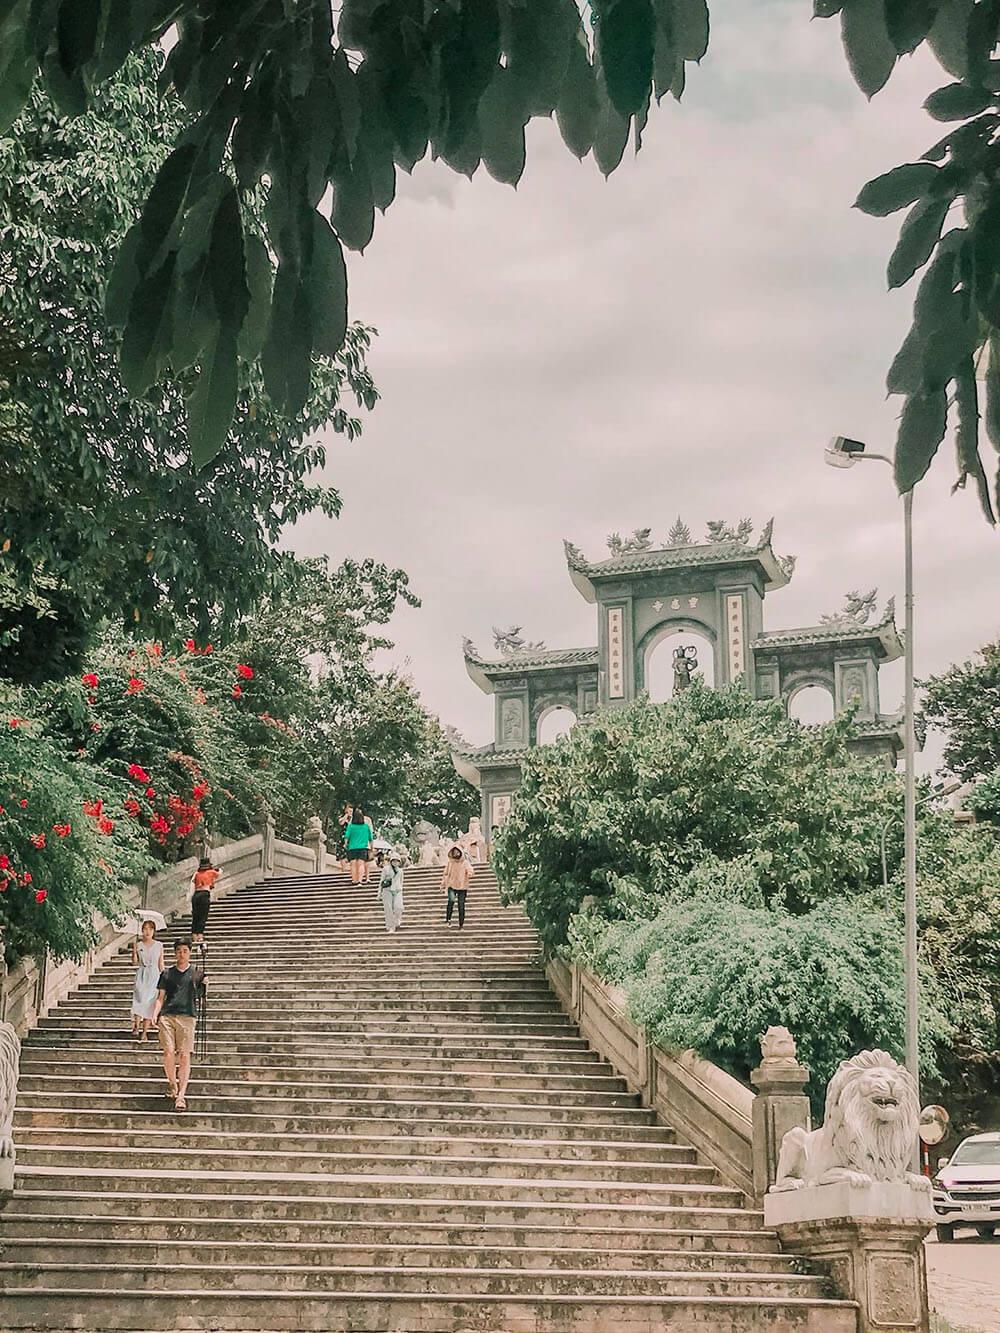 Chua Linh Ung Son Tra Review Chuyen Du Lich Hoi An Da Nang Cua 02 Co Ban Than 01